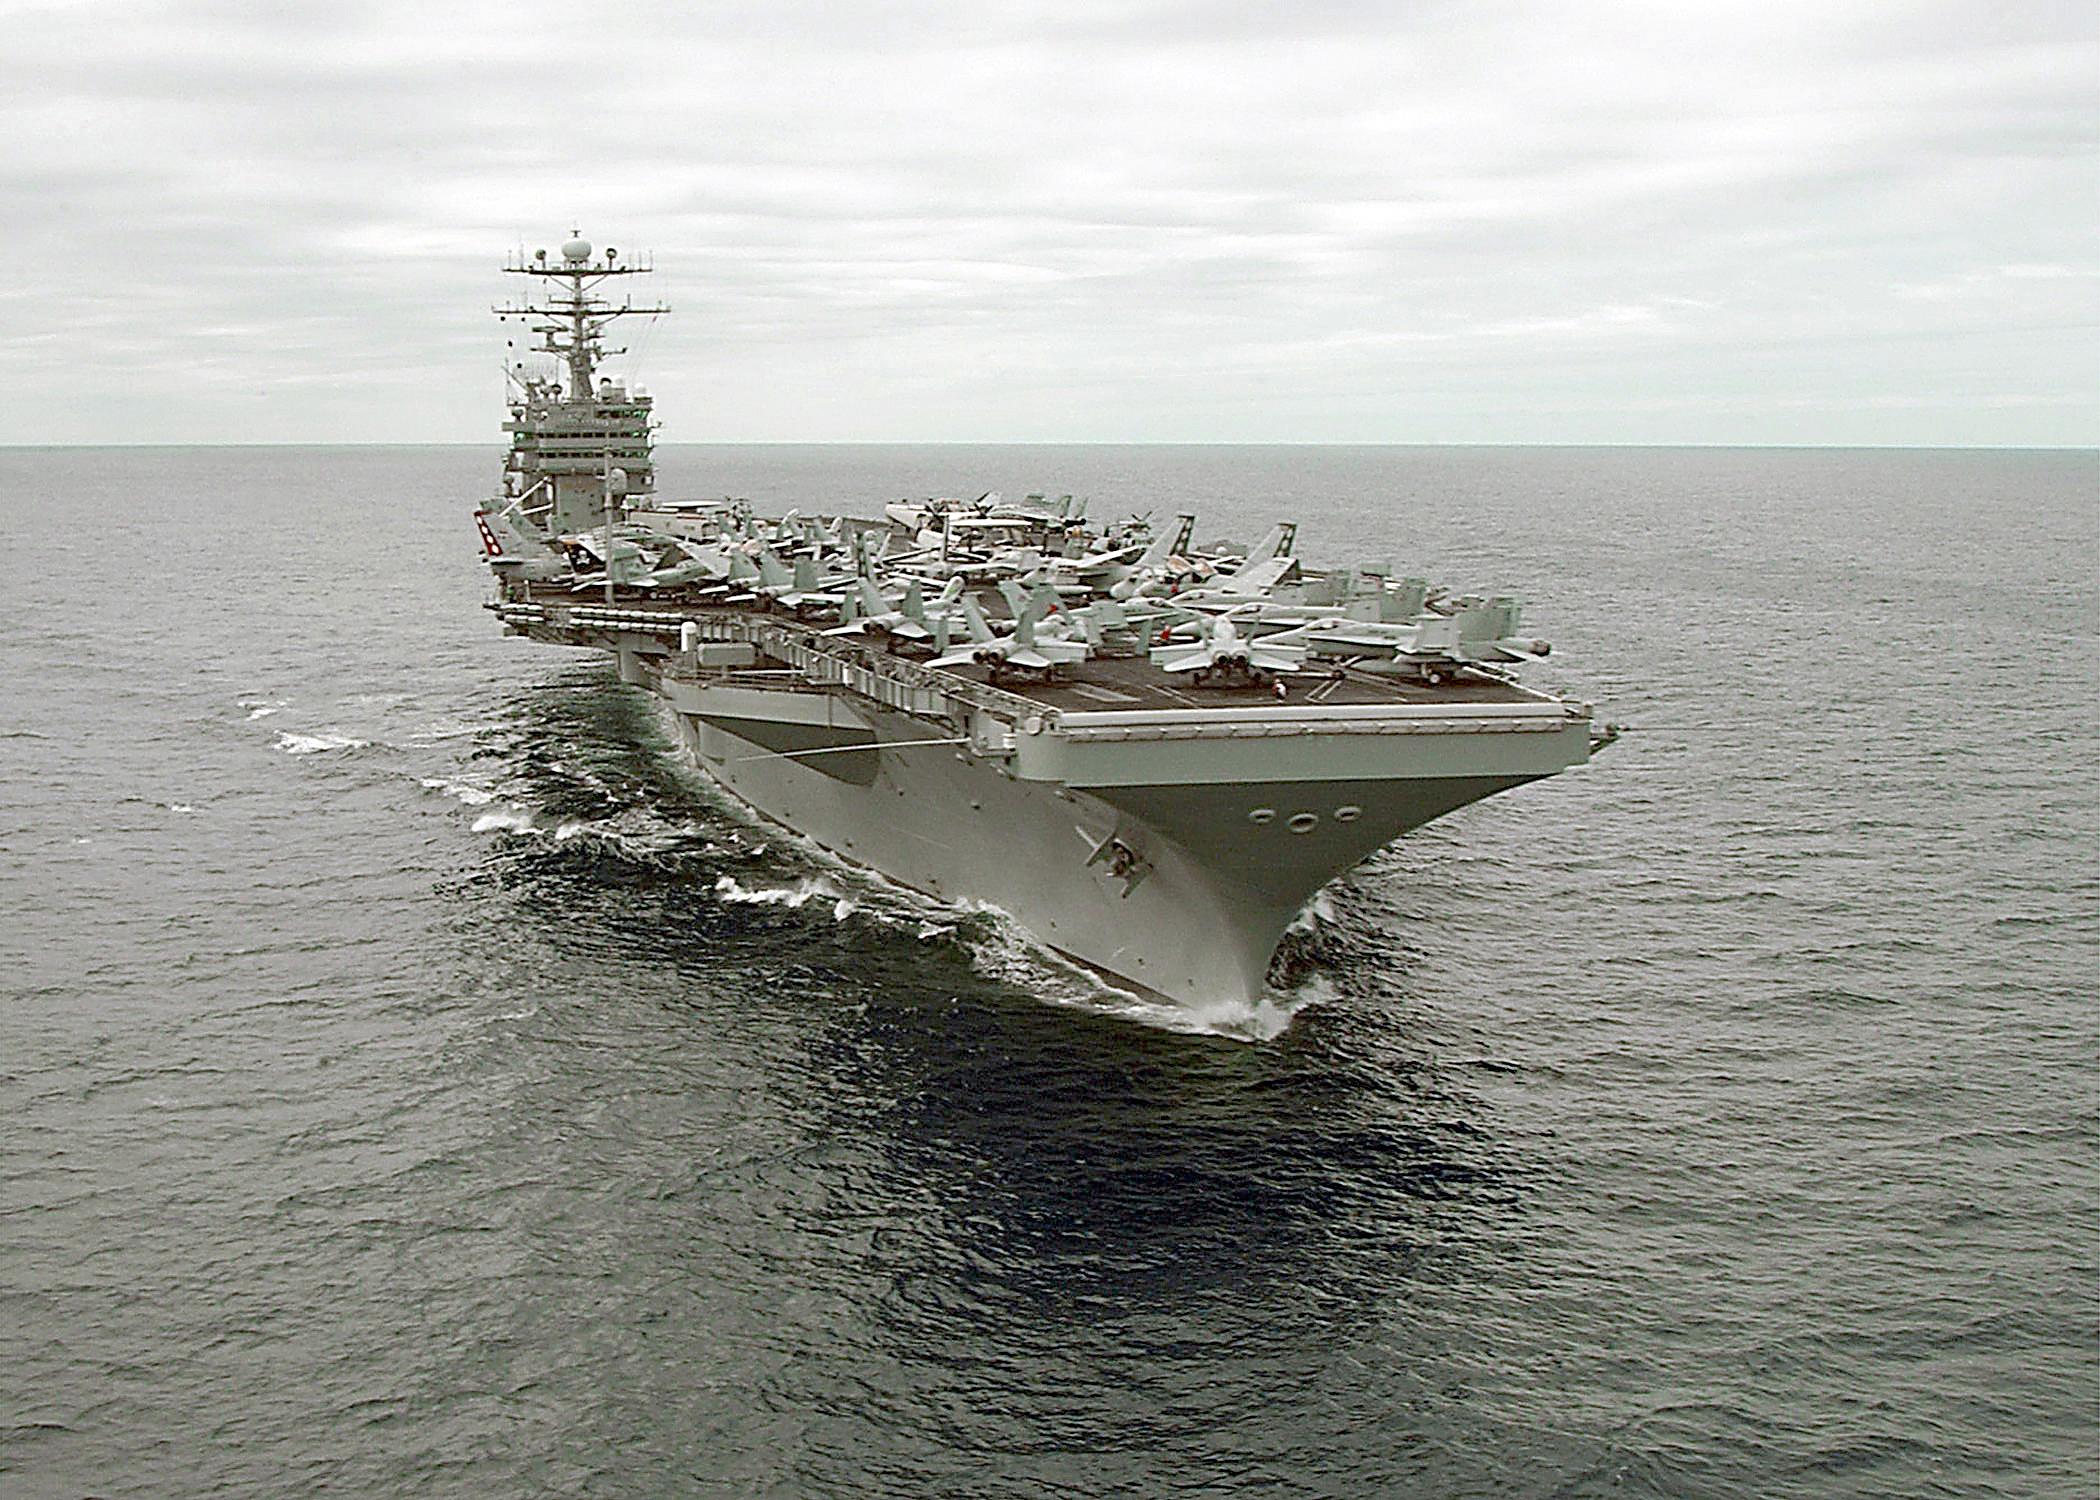 Uss George Washington (cvn 73) At Sea..